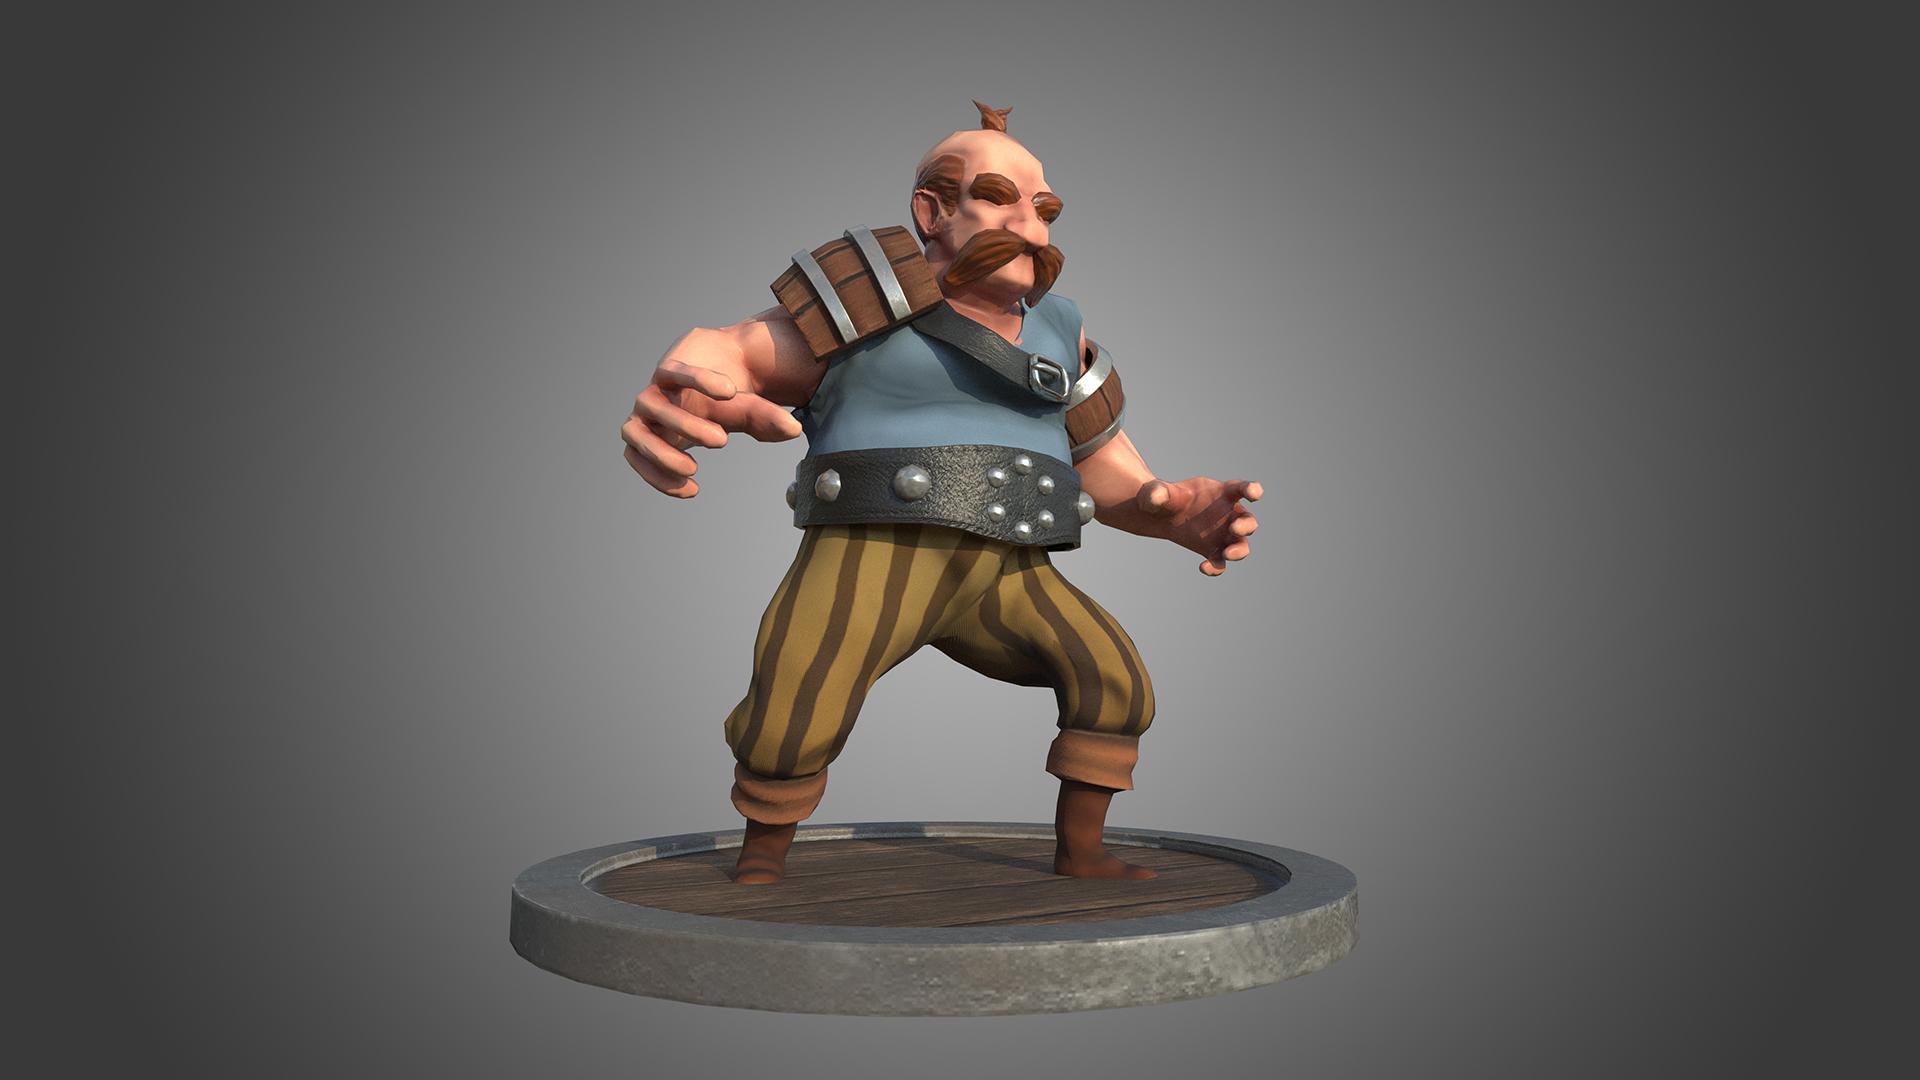 Tavernkeeper